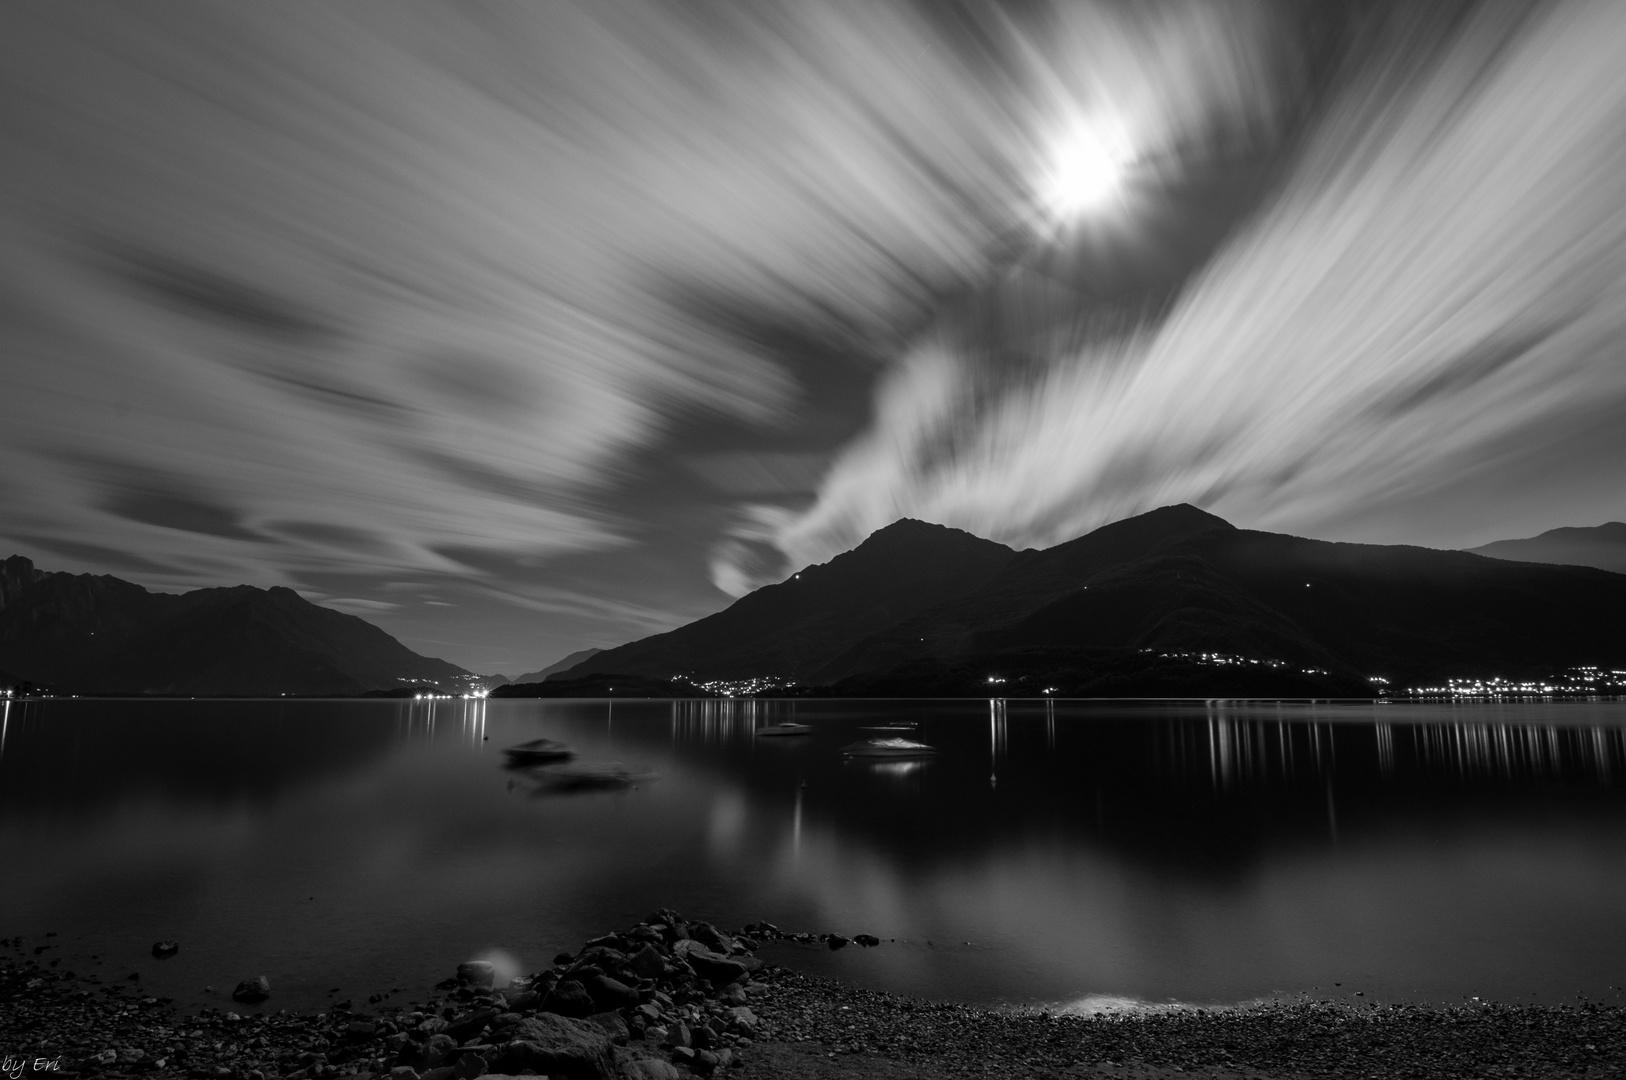 Mondnacht am Comer See